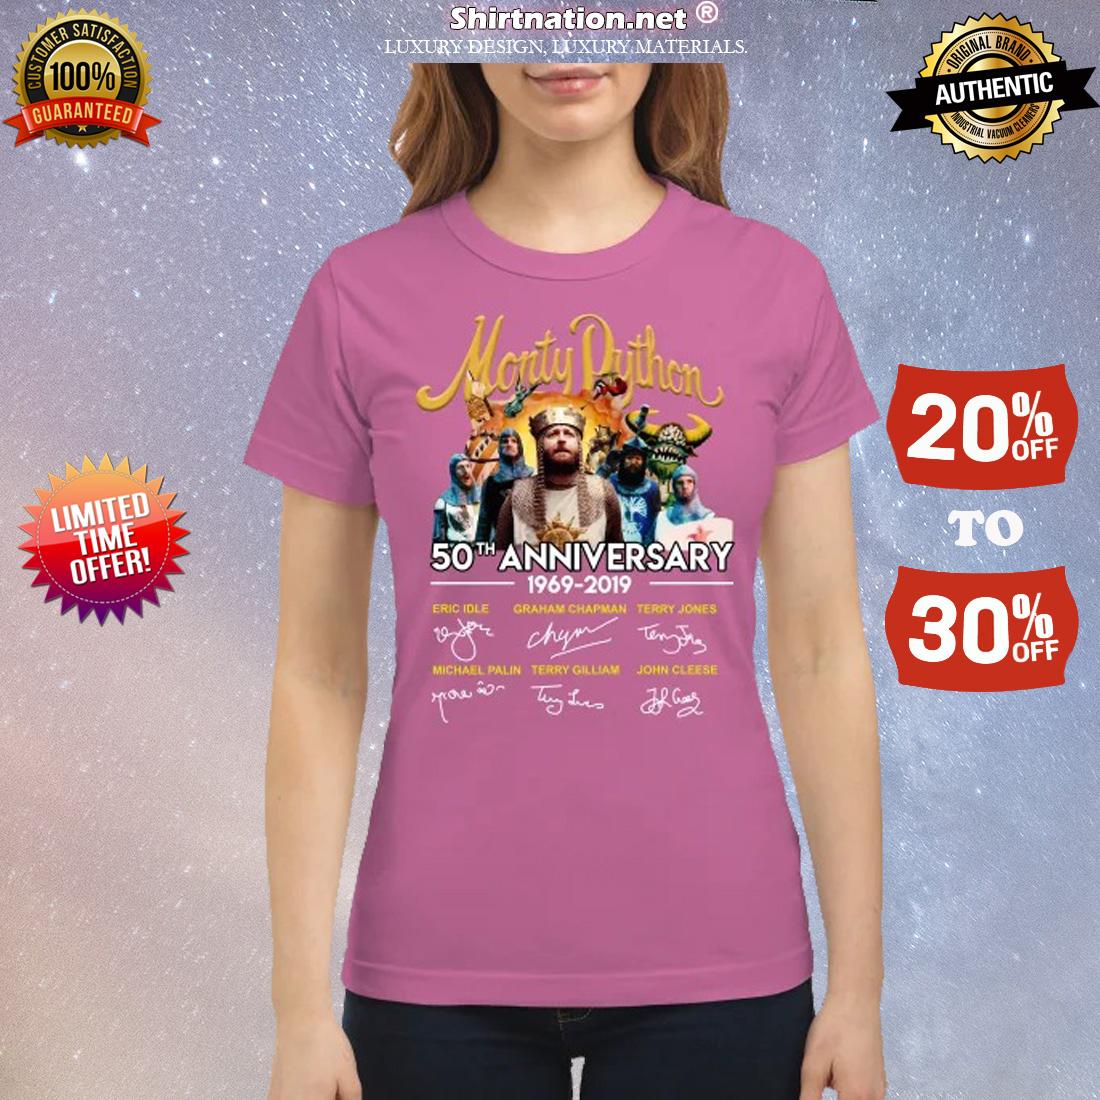 Monty Dython 50th anniversary classic shirt